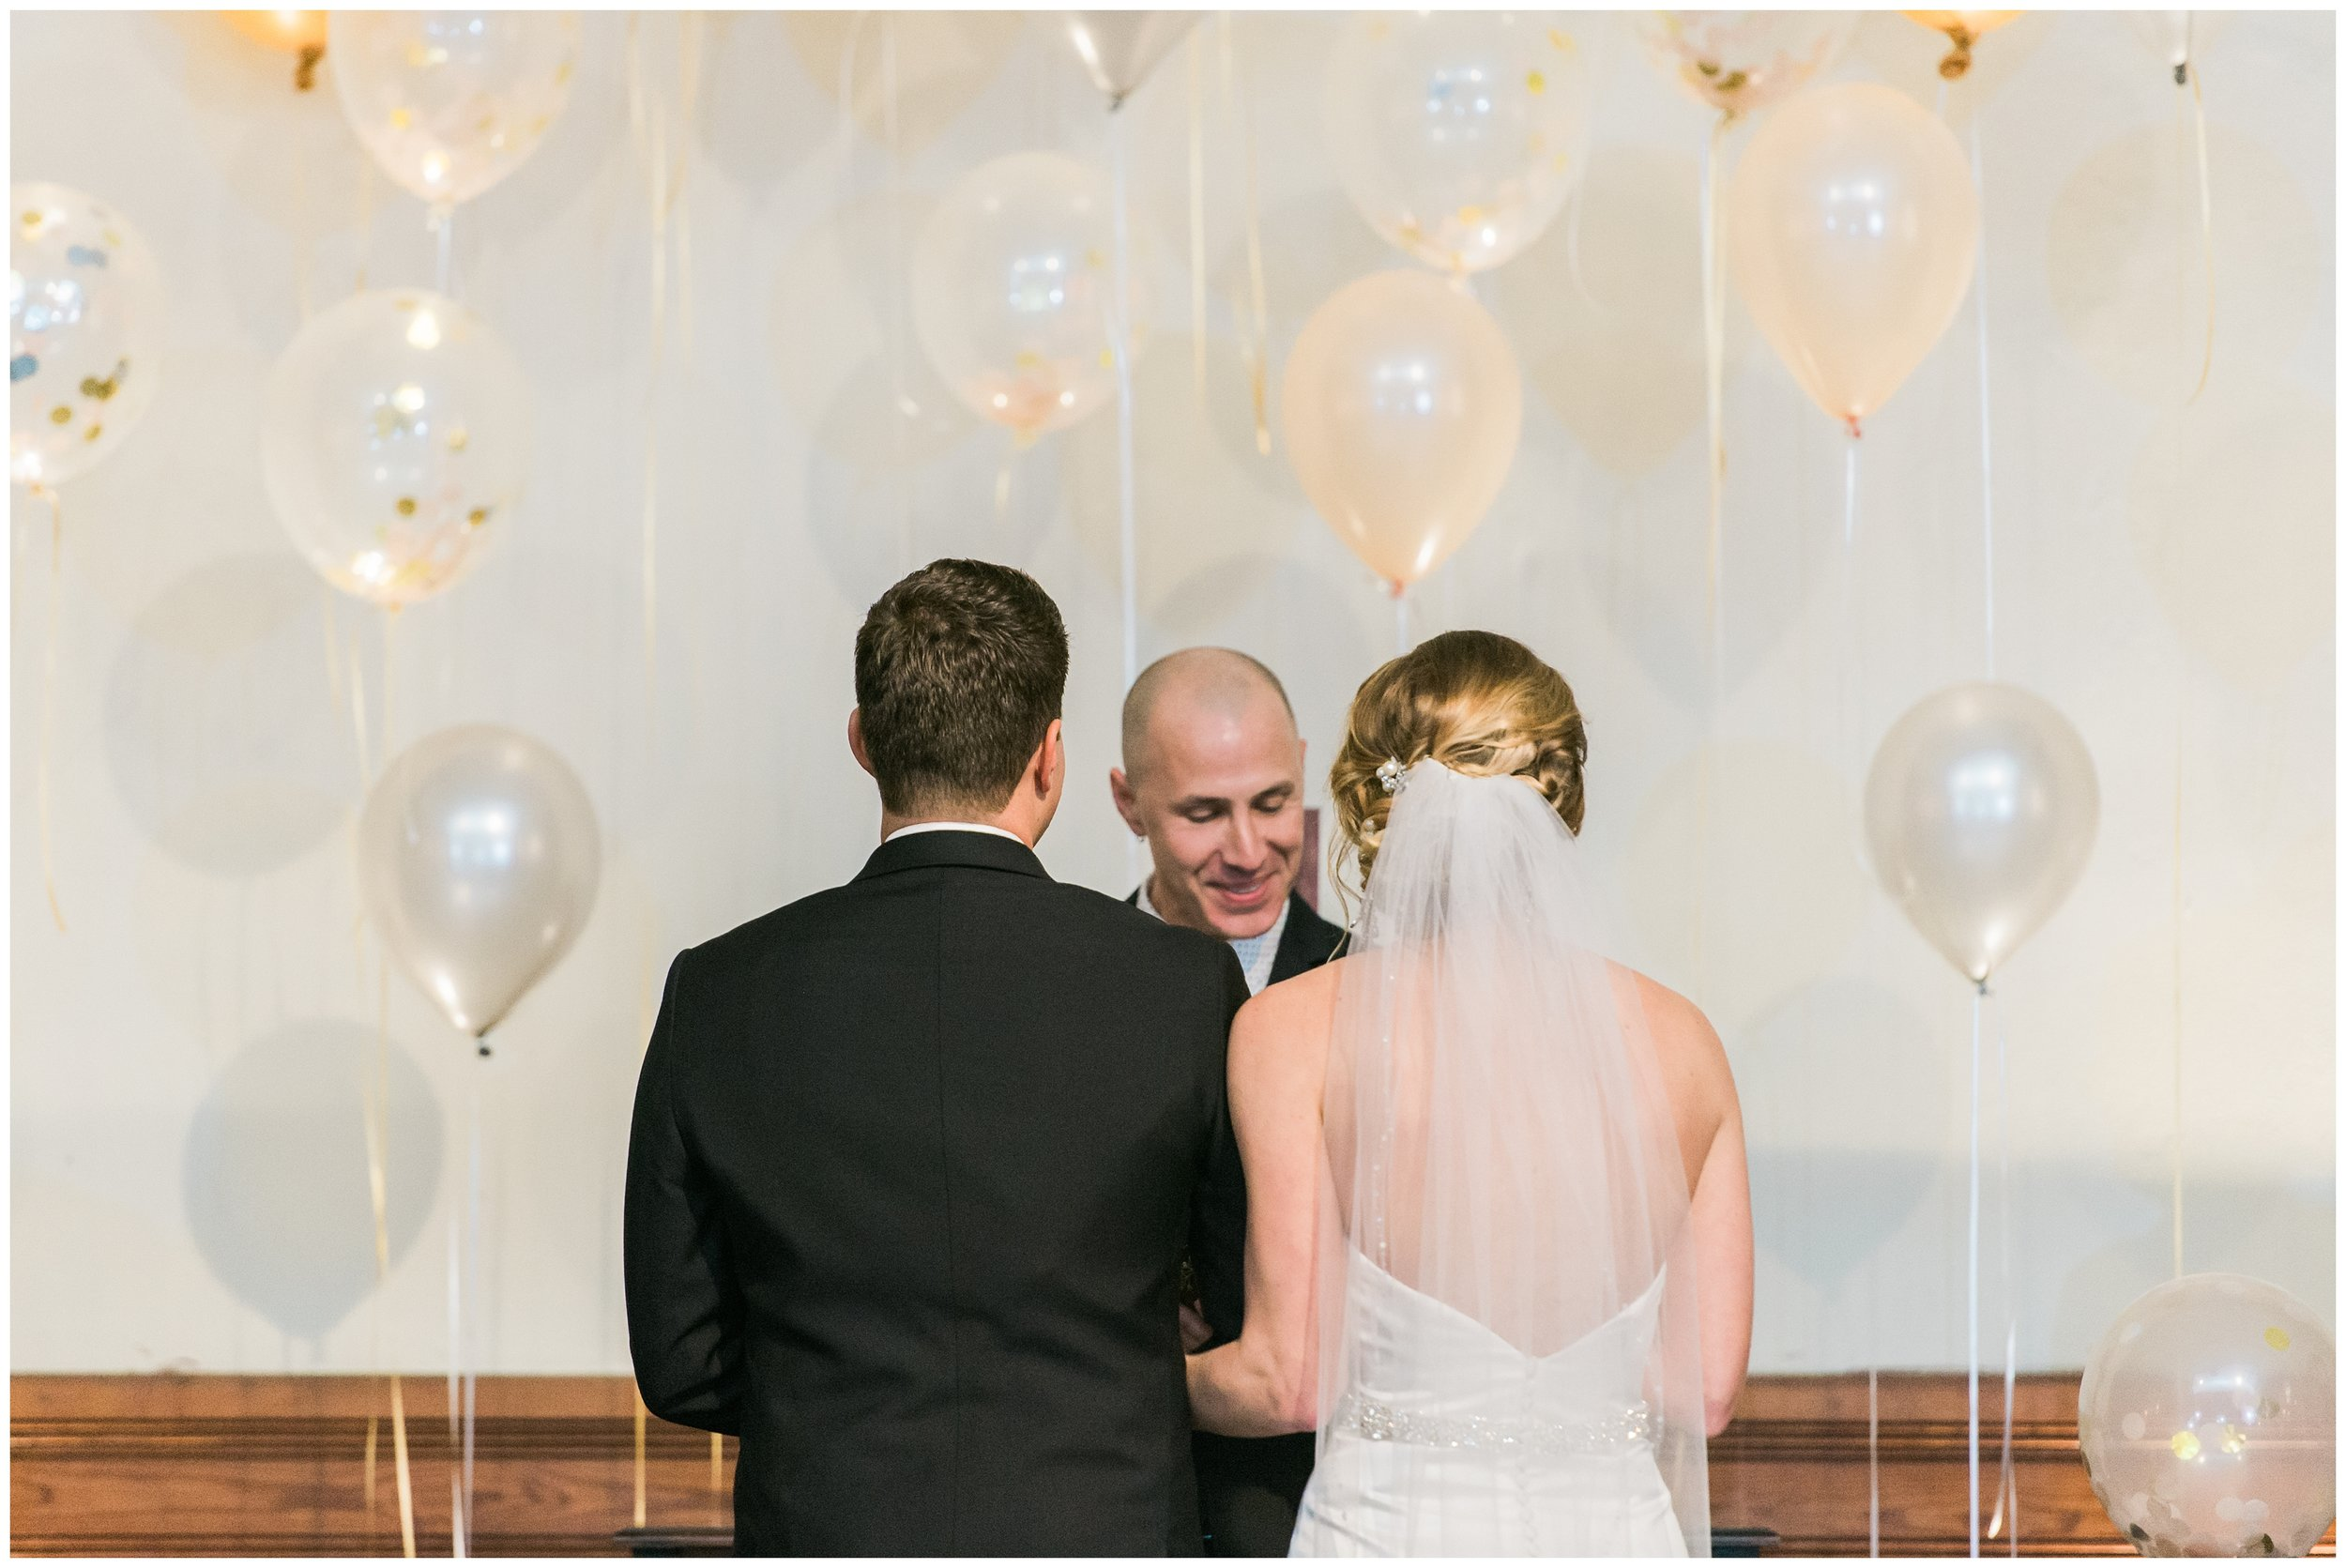 Rebecca_Bridges_Photography_Indianapolis_Wedding_Photographer_5832.jpg